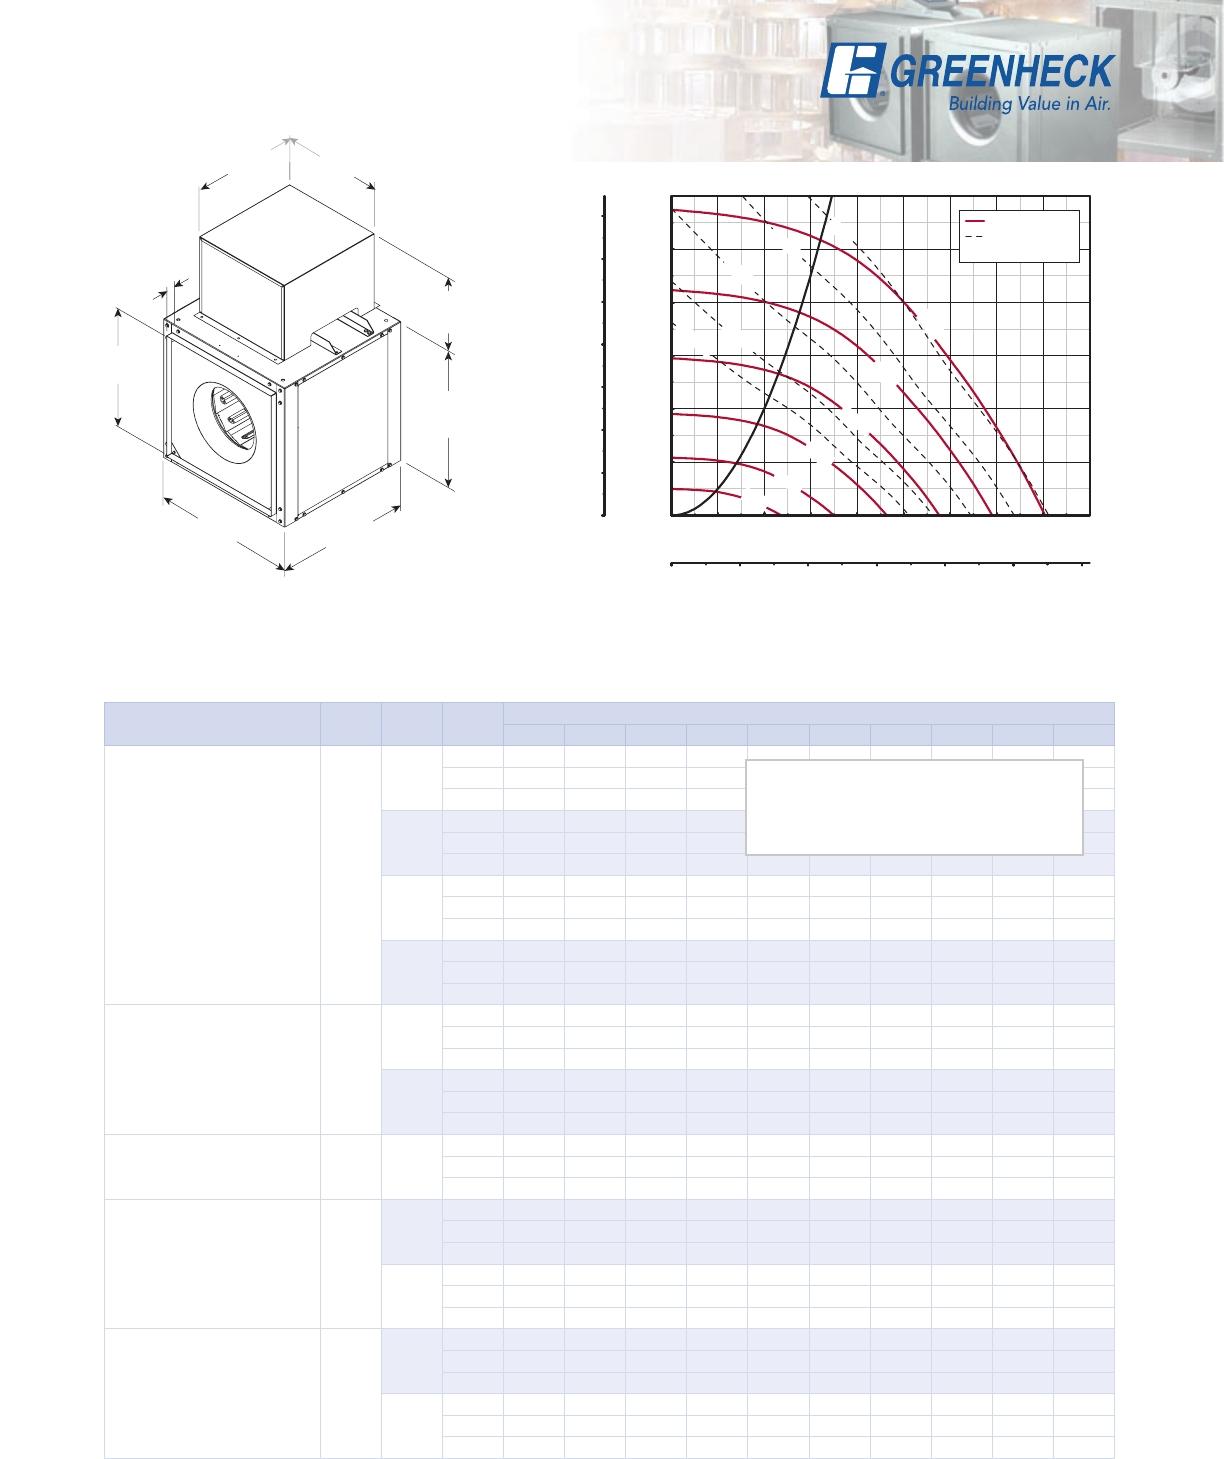 greenheck sq wiring diagram | free wiring diagram greenheck wiring diagrams #7